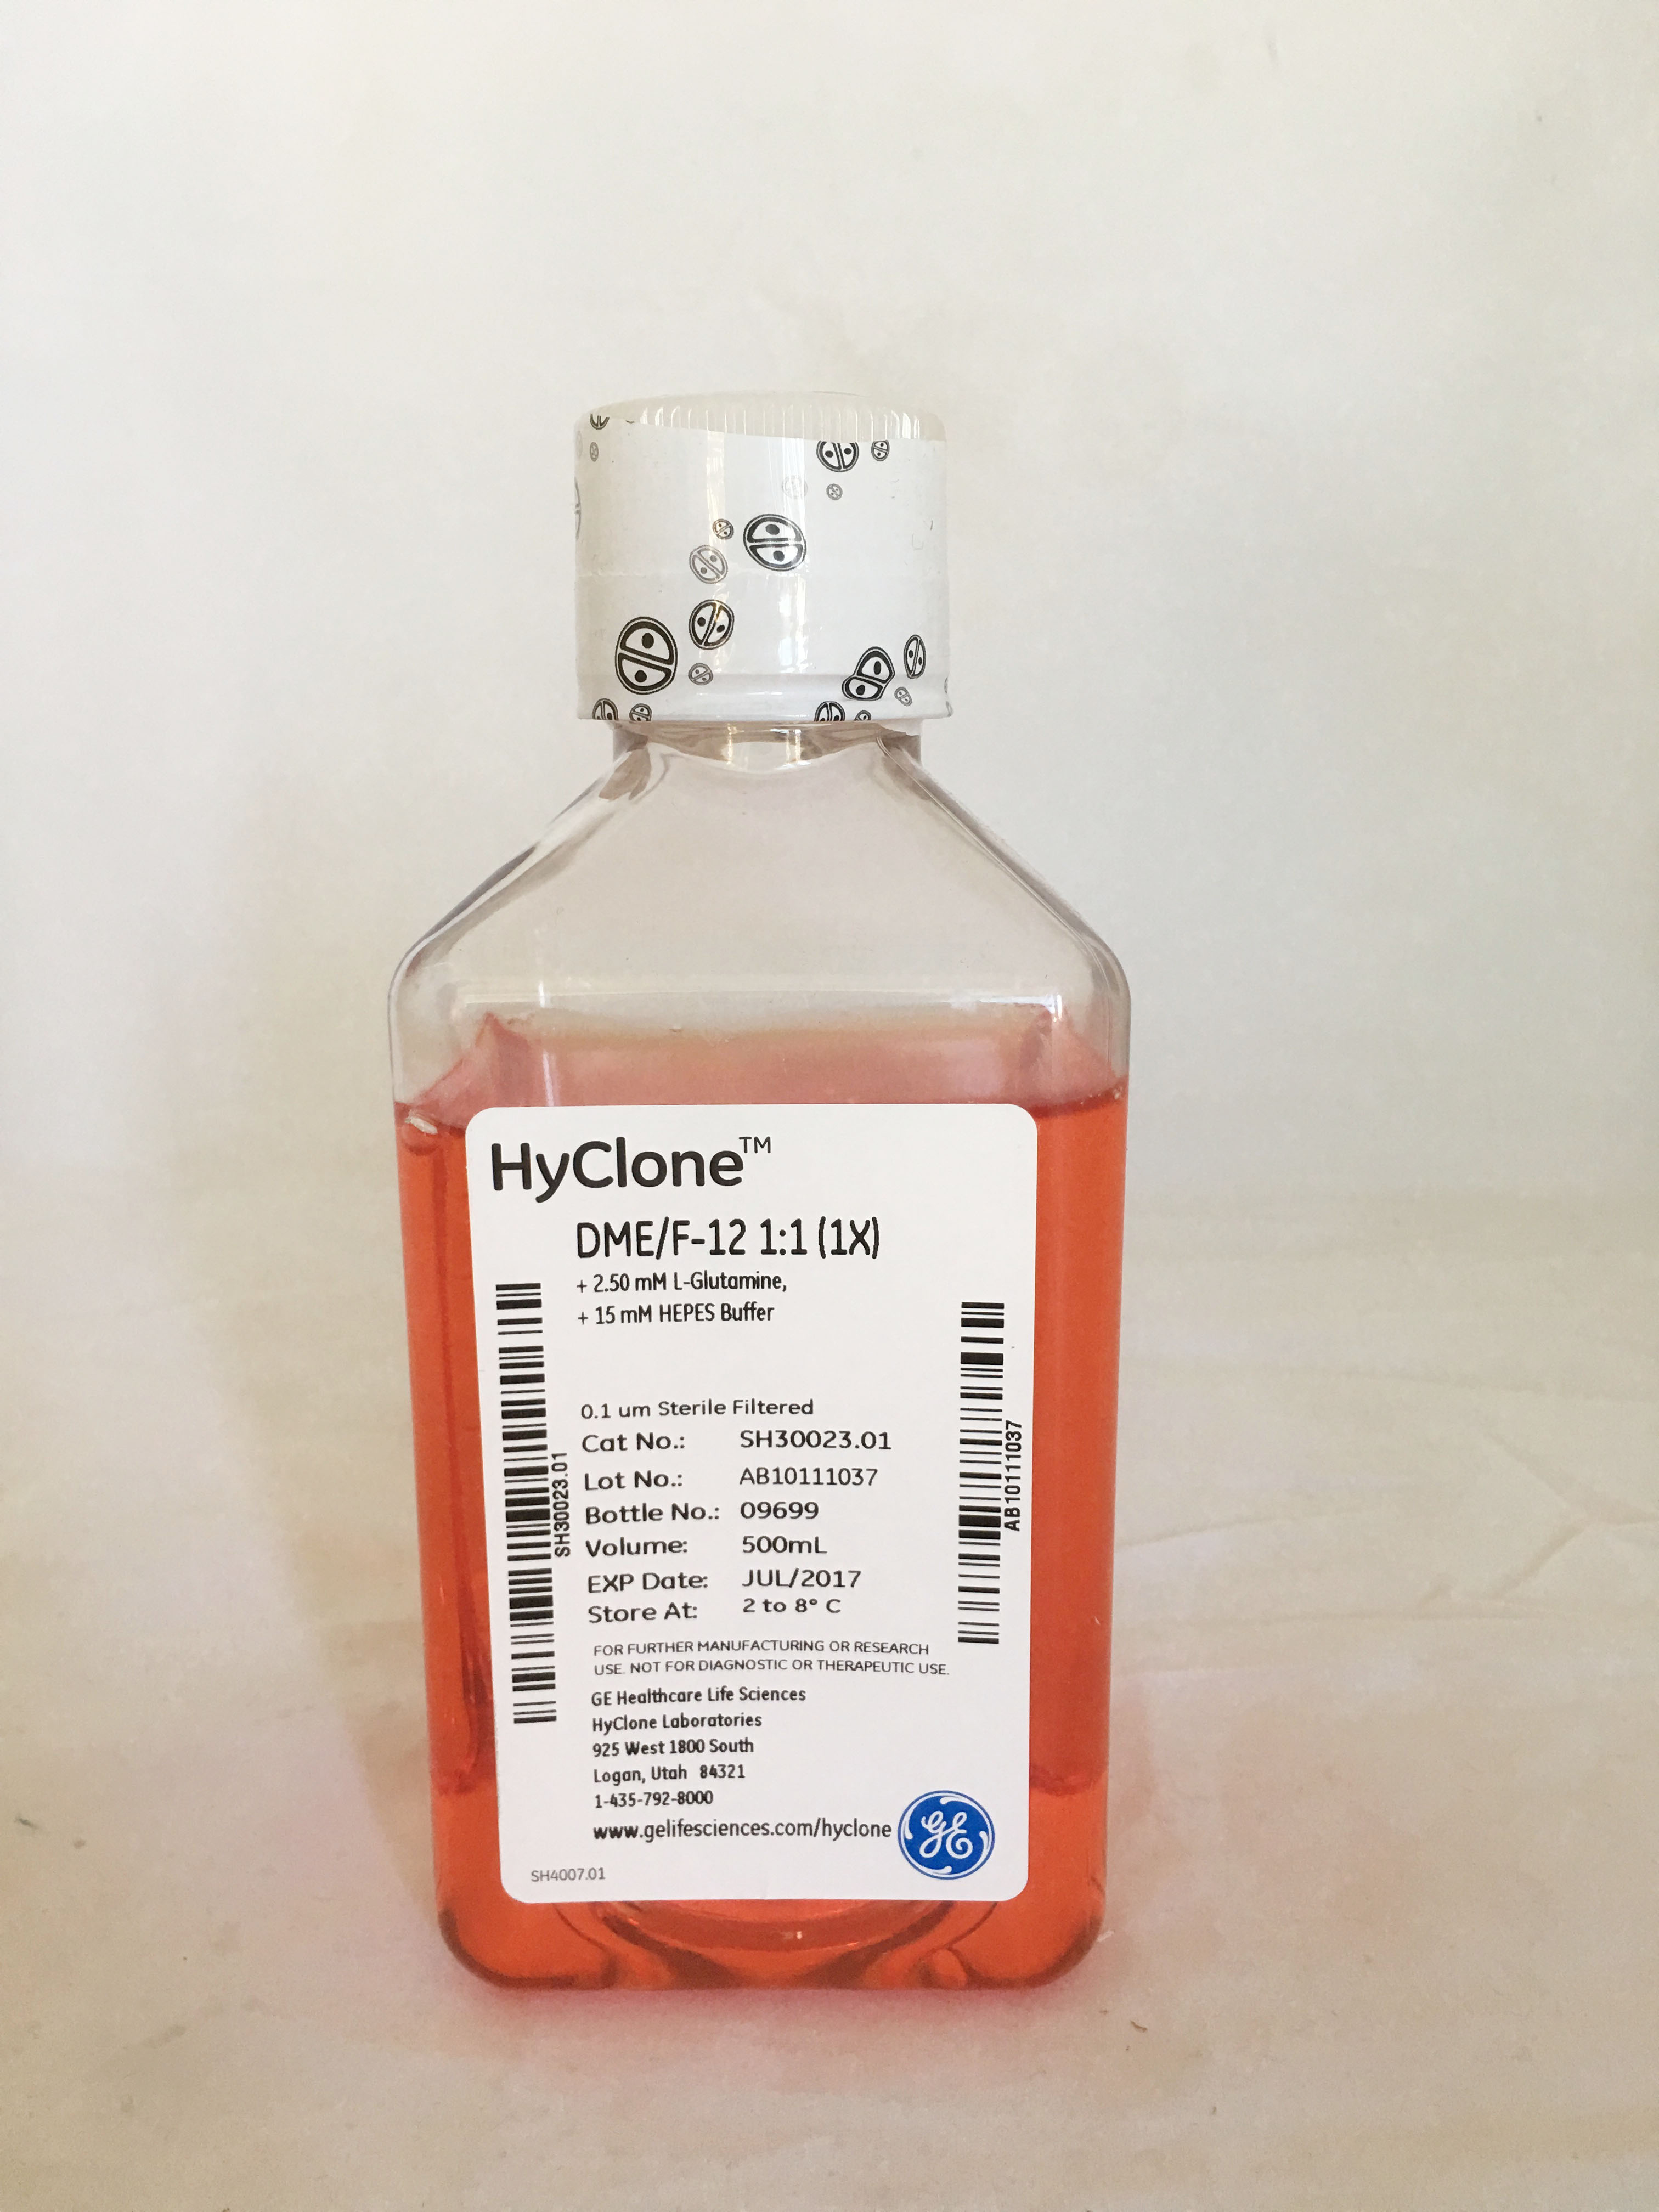 DMEM/F12(D/F12)培养基 1:1(美国原装进口), 500ml SH30023.01(替代原国产分装产品SH30023.01B),含2.50 mM L-谷氨酰胺,15 mM HEPES  HyClone